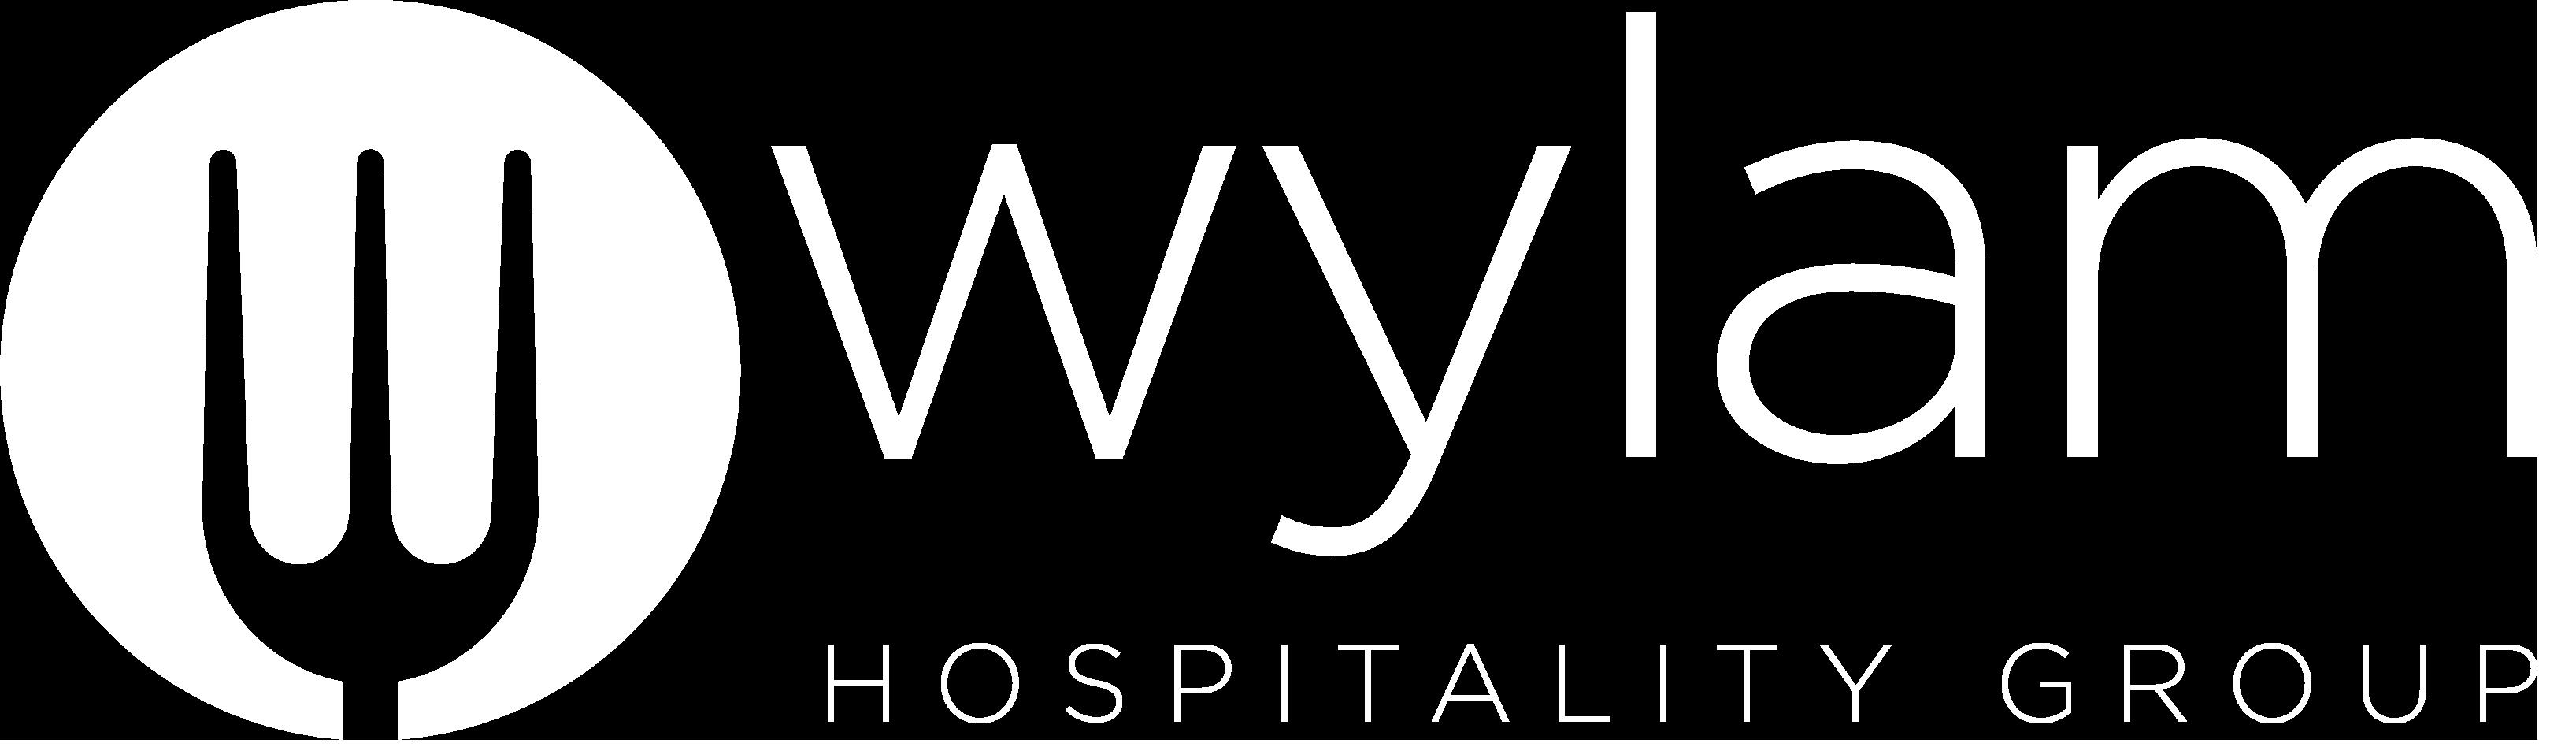 Wylam Hospitality Group Logo